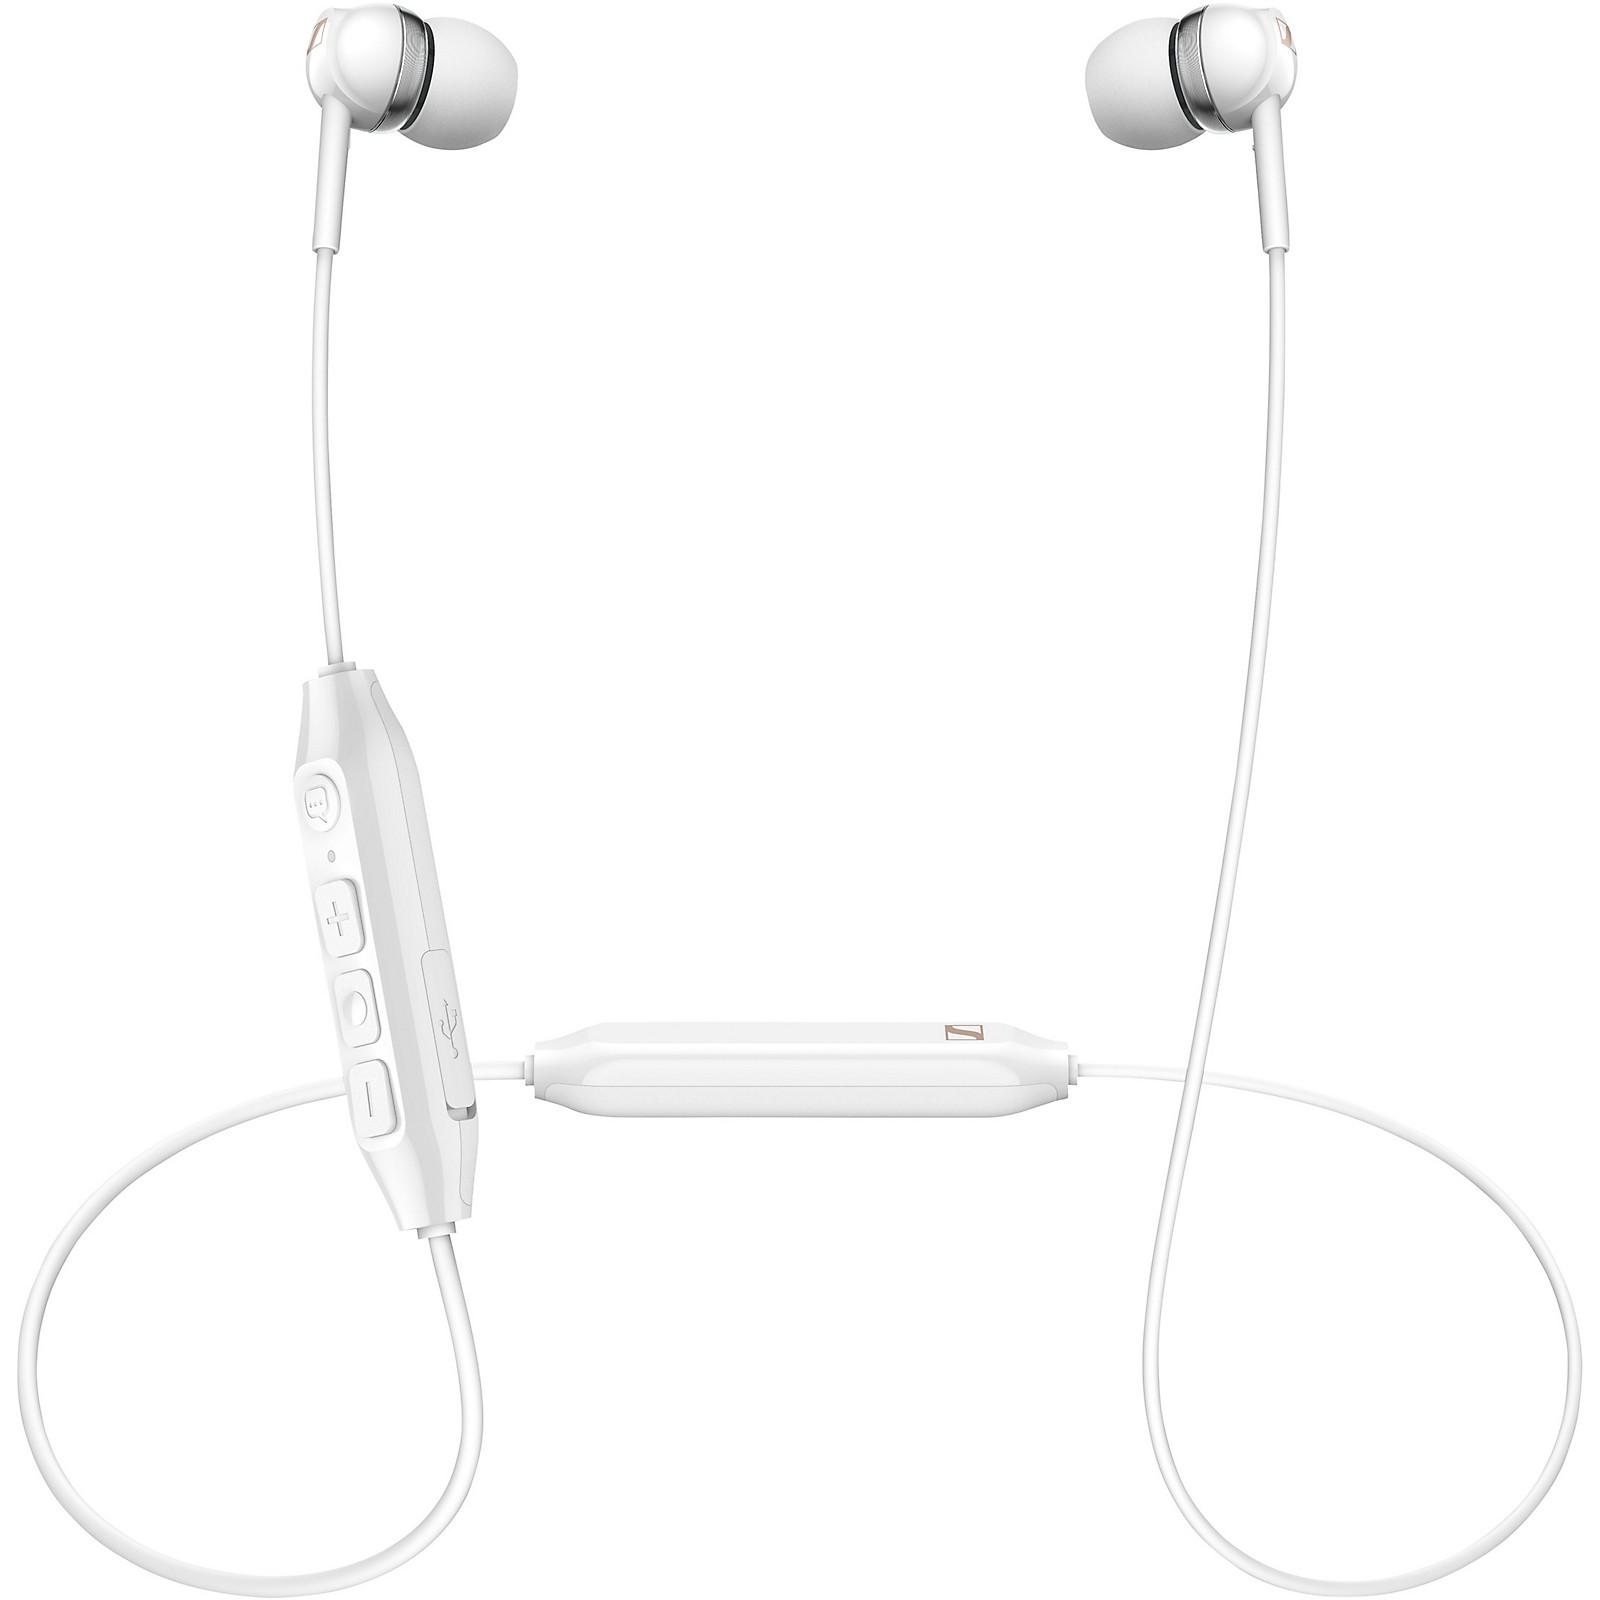 Sennheiser CX 350BT Wireless Earbuds